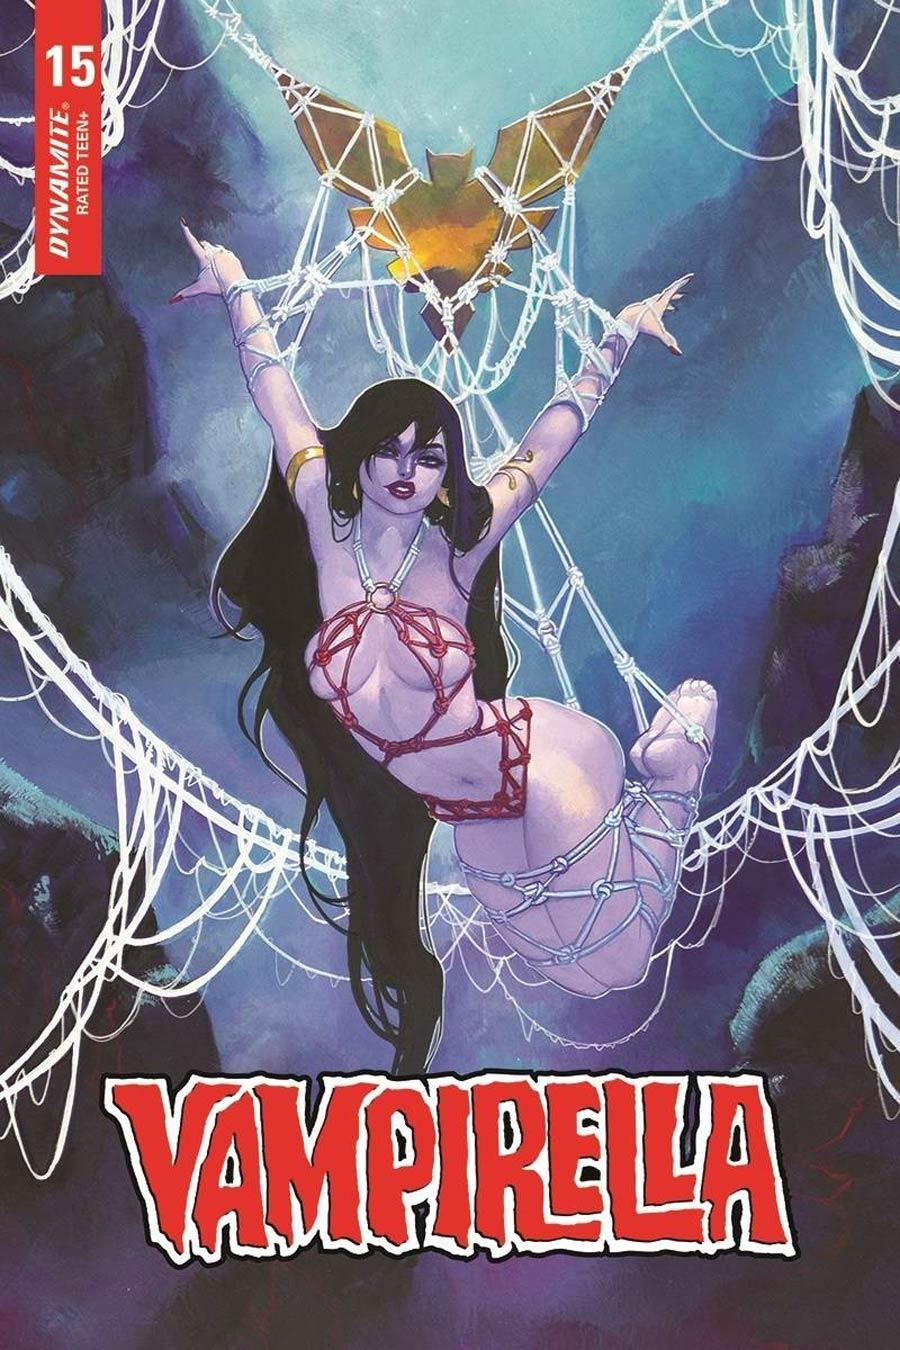 Vampirella Vol 8 #15 Cover G Variant Meghan Hetrick Cover